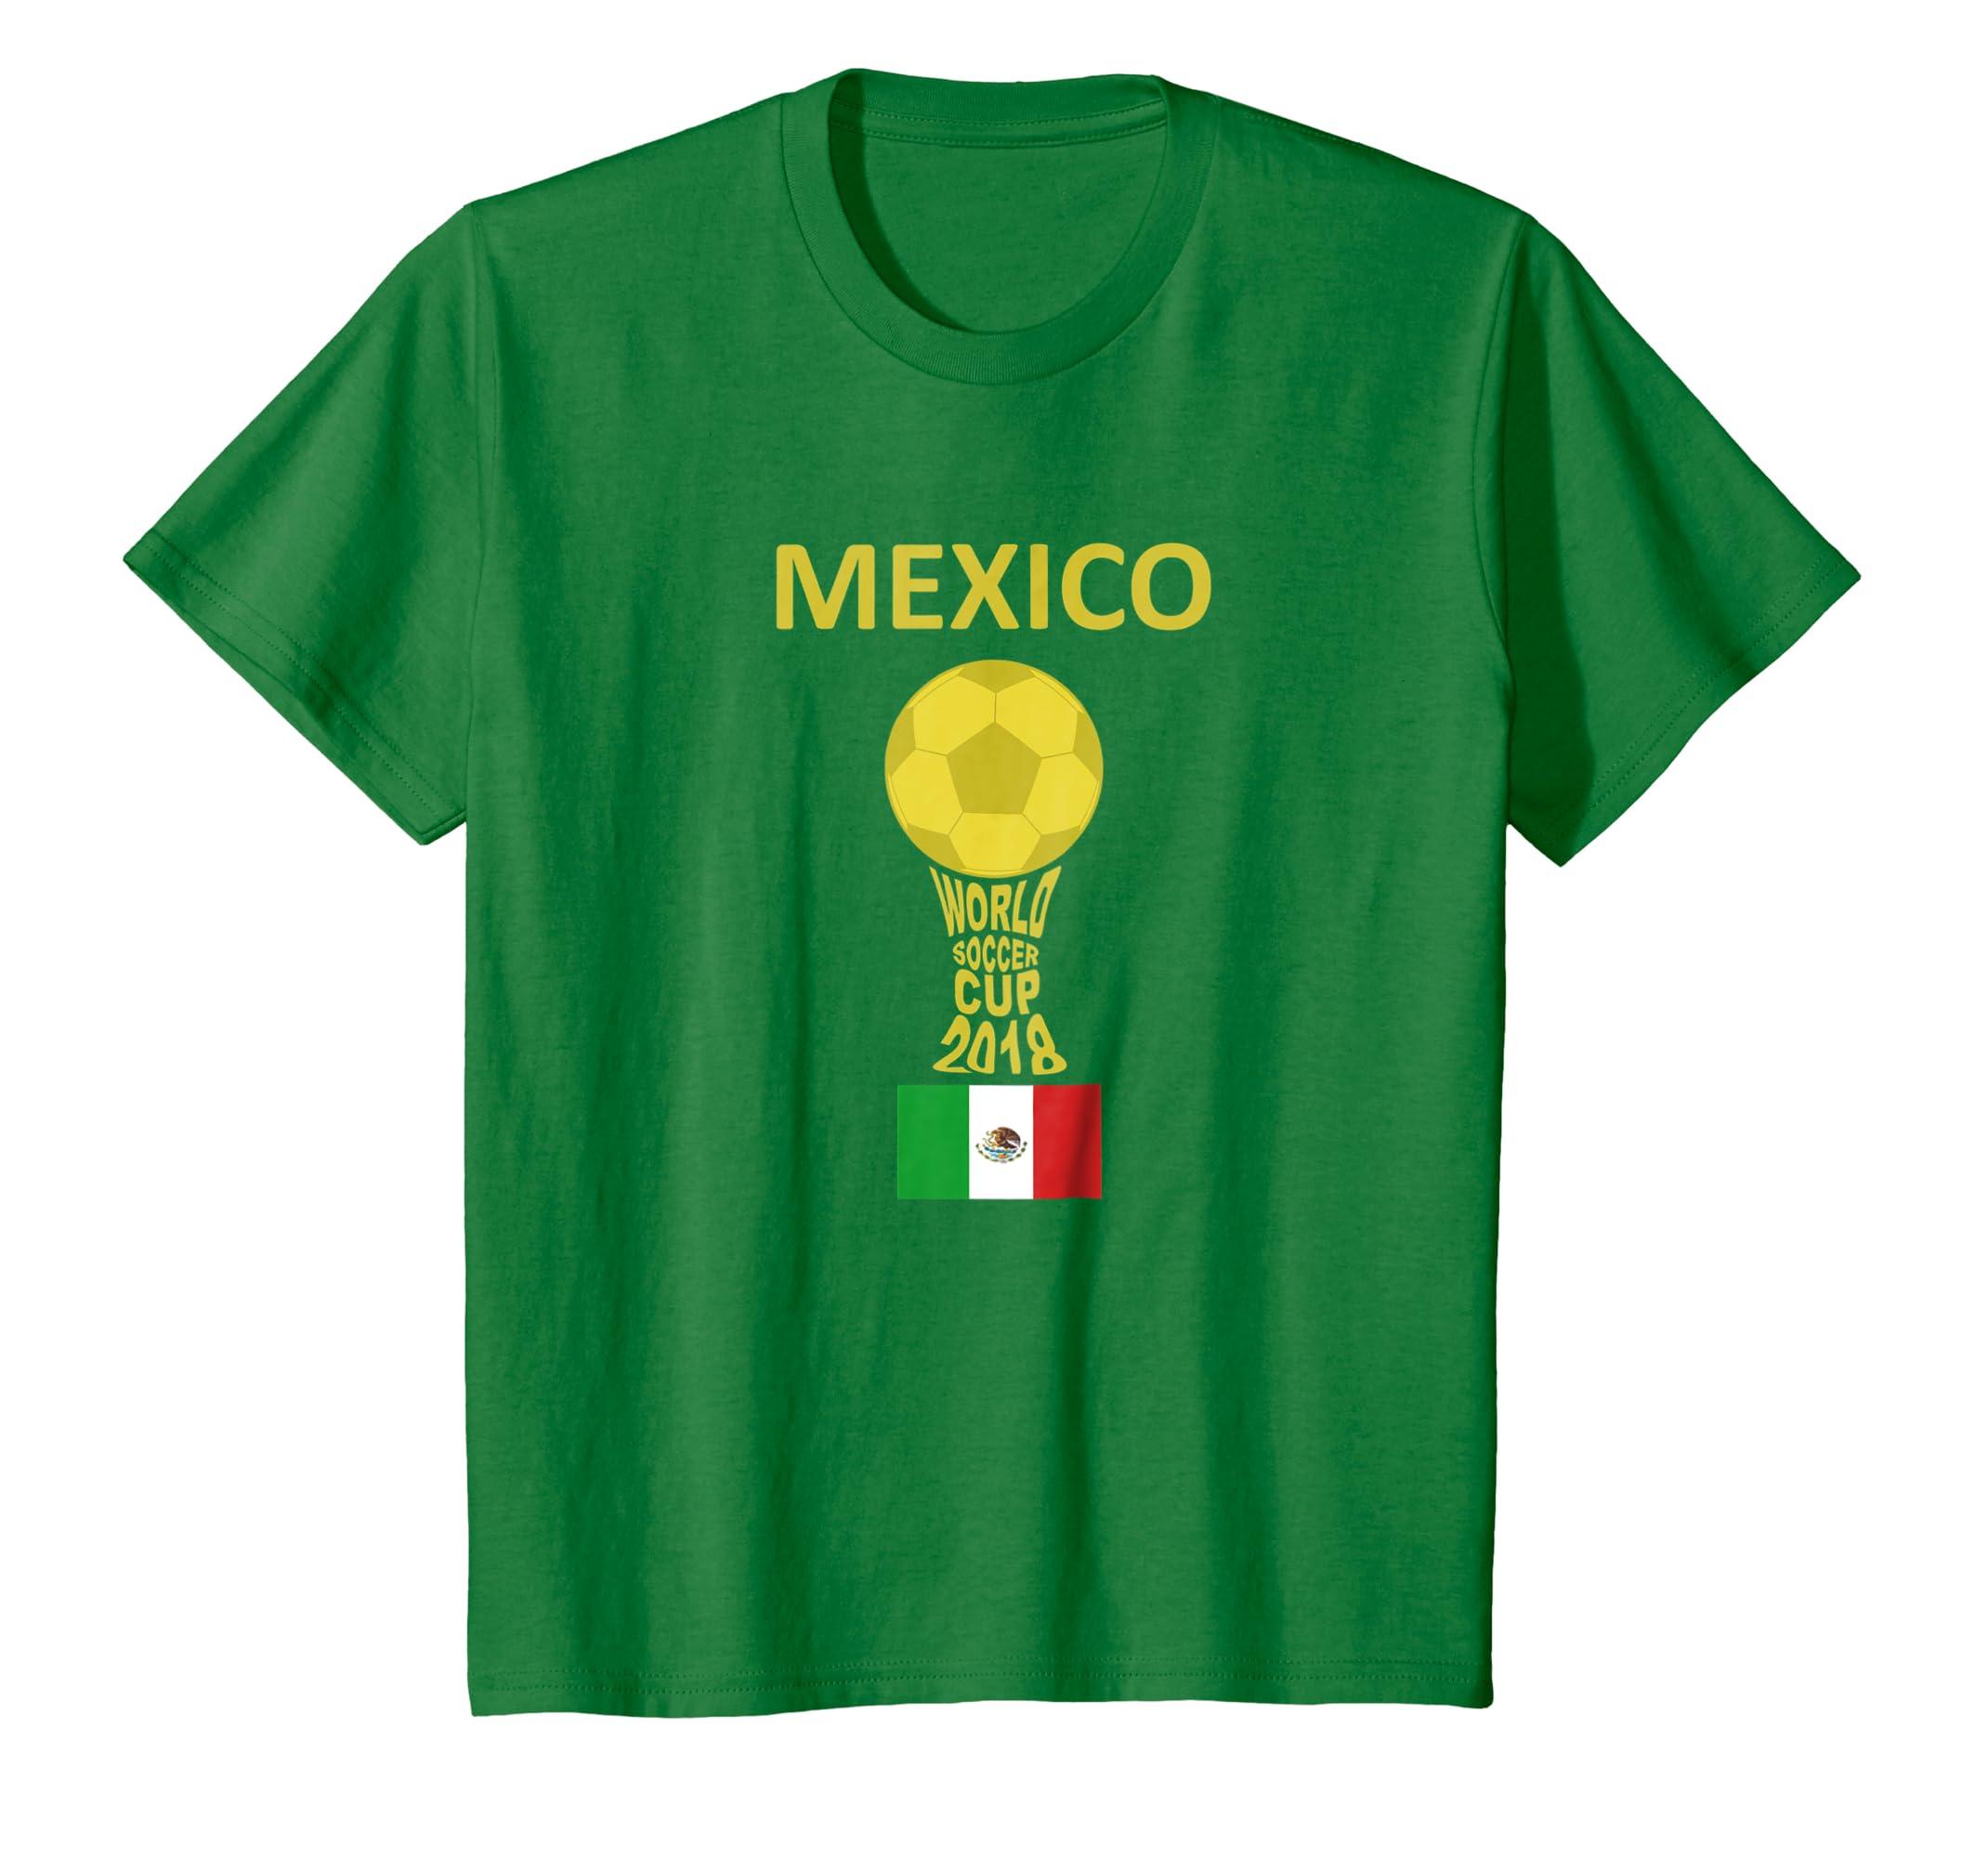 Amazon.com: Mexico Soccer 2018 World Futbol Cup Camiseta T-shirt: Clothing